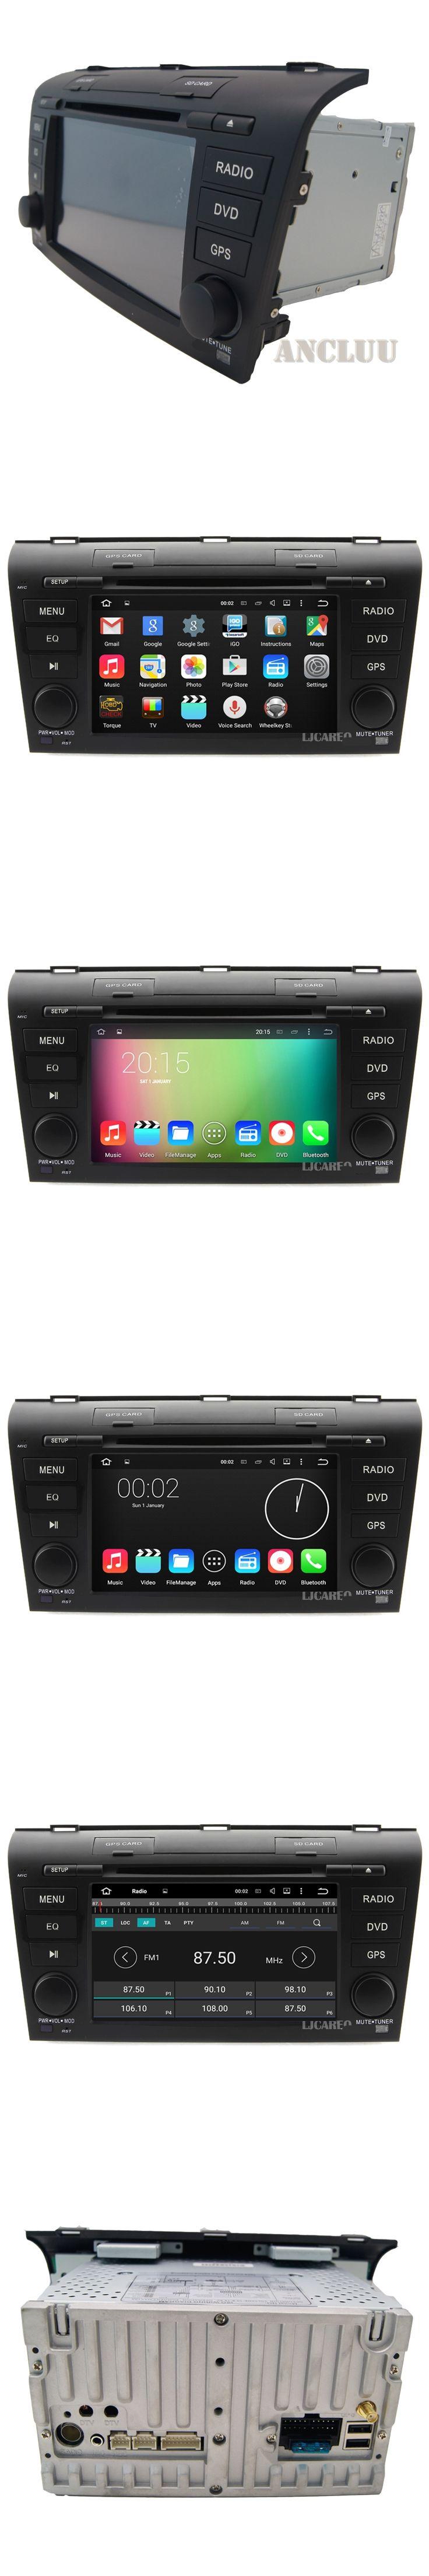 7 inch Quad core Android 5.1 Car DVD Player for MAZDA 3 MAZDA3 2004 2005 2006 2007 2008 2009 Radio GPS head unit bluetooth map